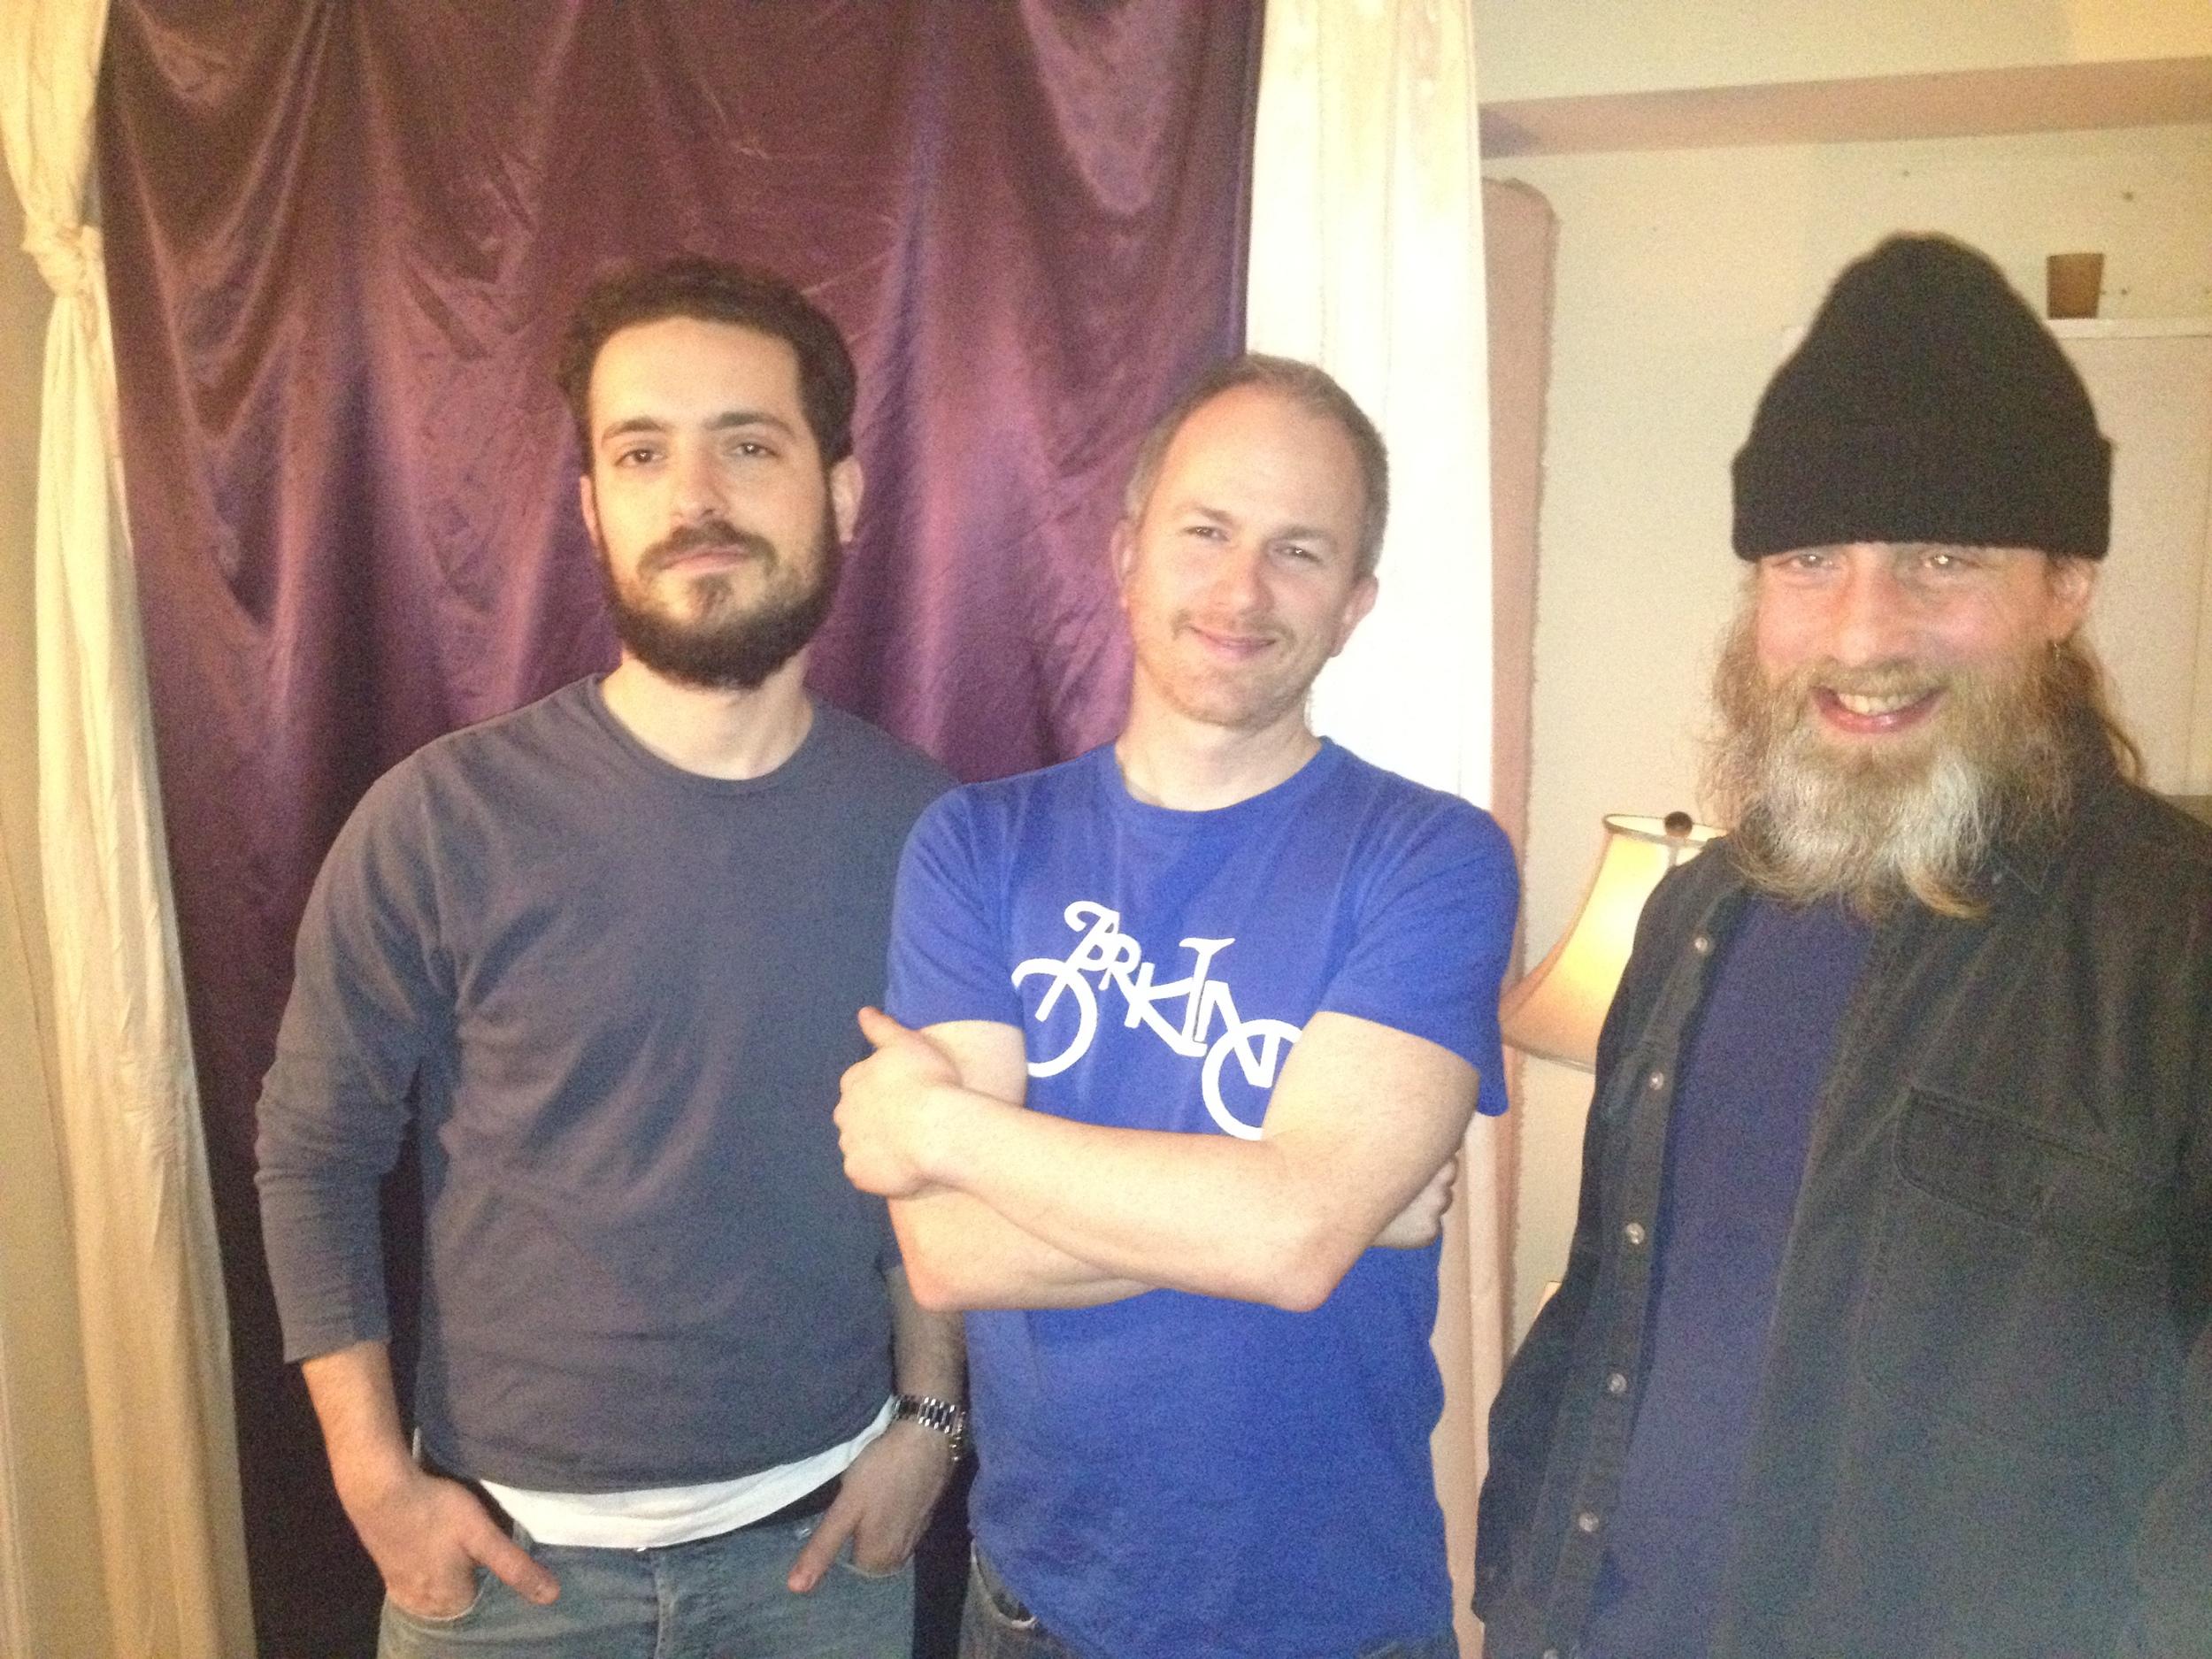 Ariel Wesissberger, Robin mitchell & kevin hummel